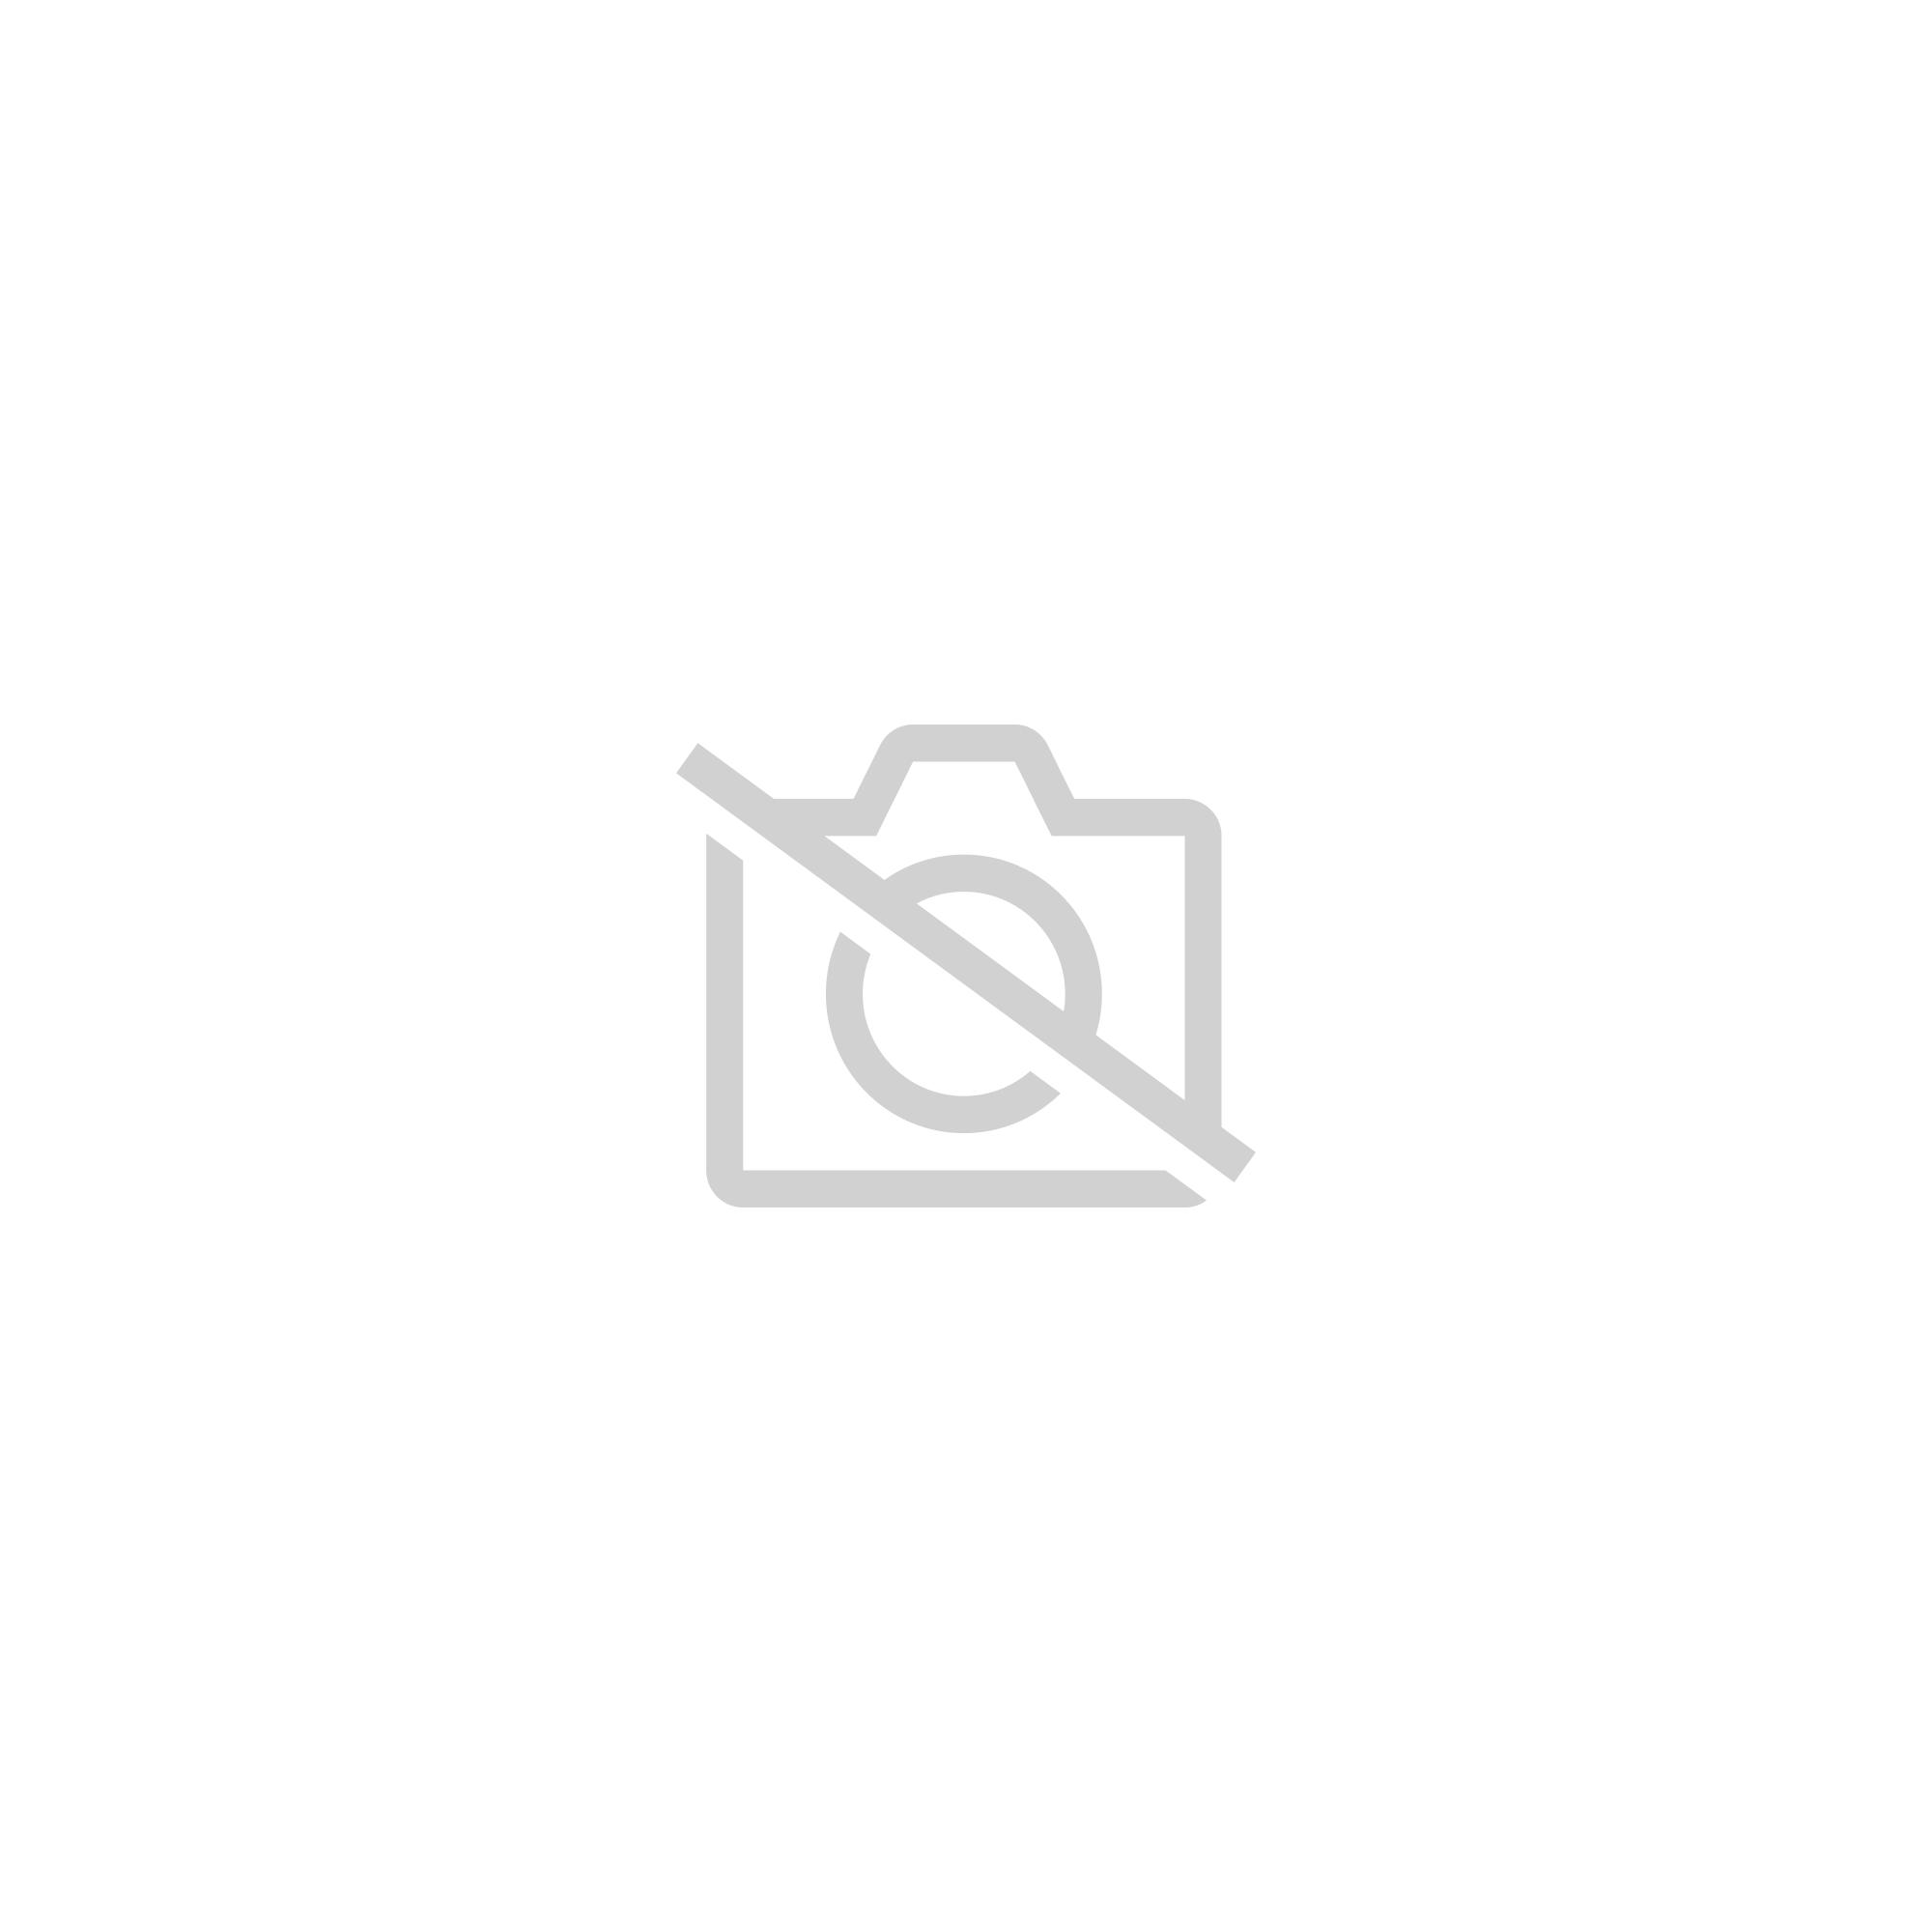 Samsung Galaxy S4 Mini I9190/ S4 Mini Plus I9195i/ I9192/ I9195/ I9197: Etui Portefeuille Livre Housse Coque Pochette Support Vid�o Cuir Pu + Stylet - Violet